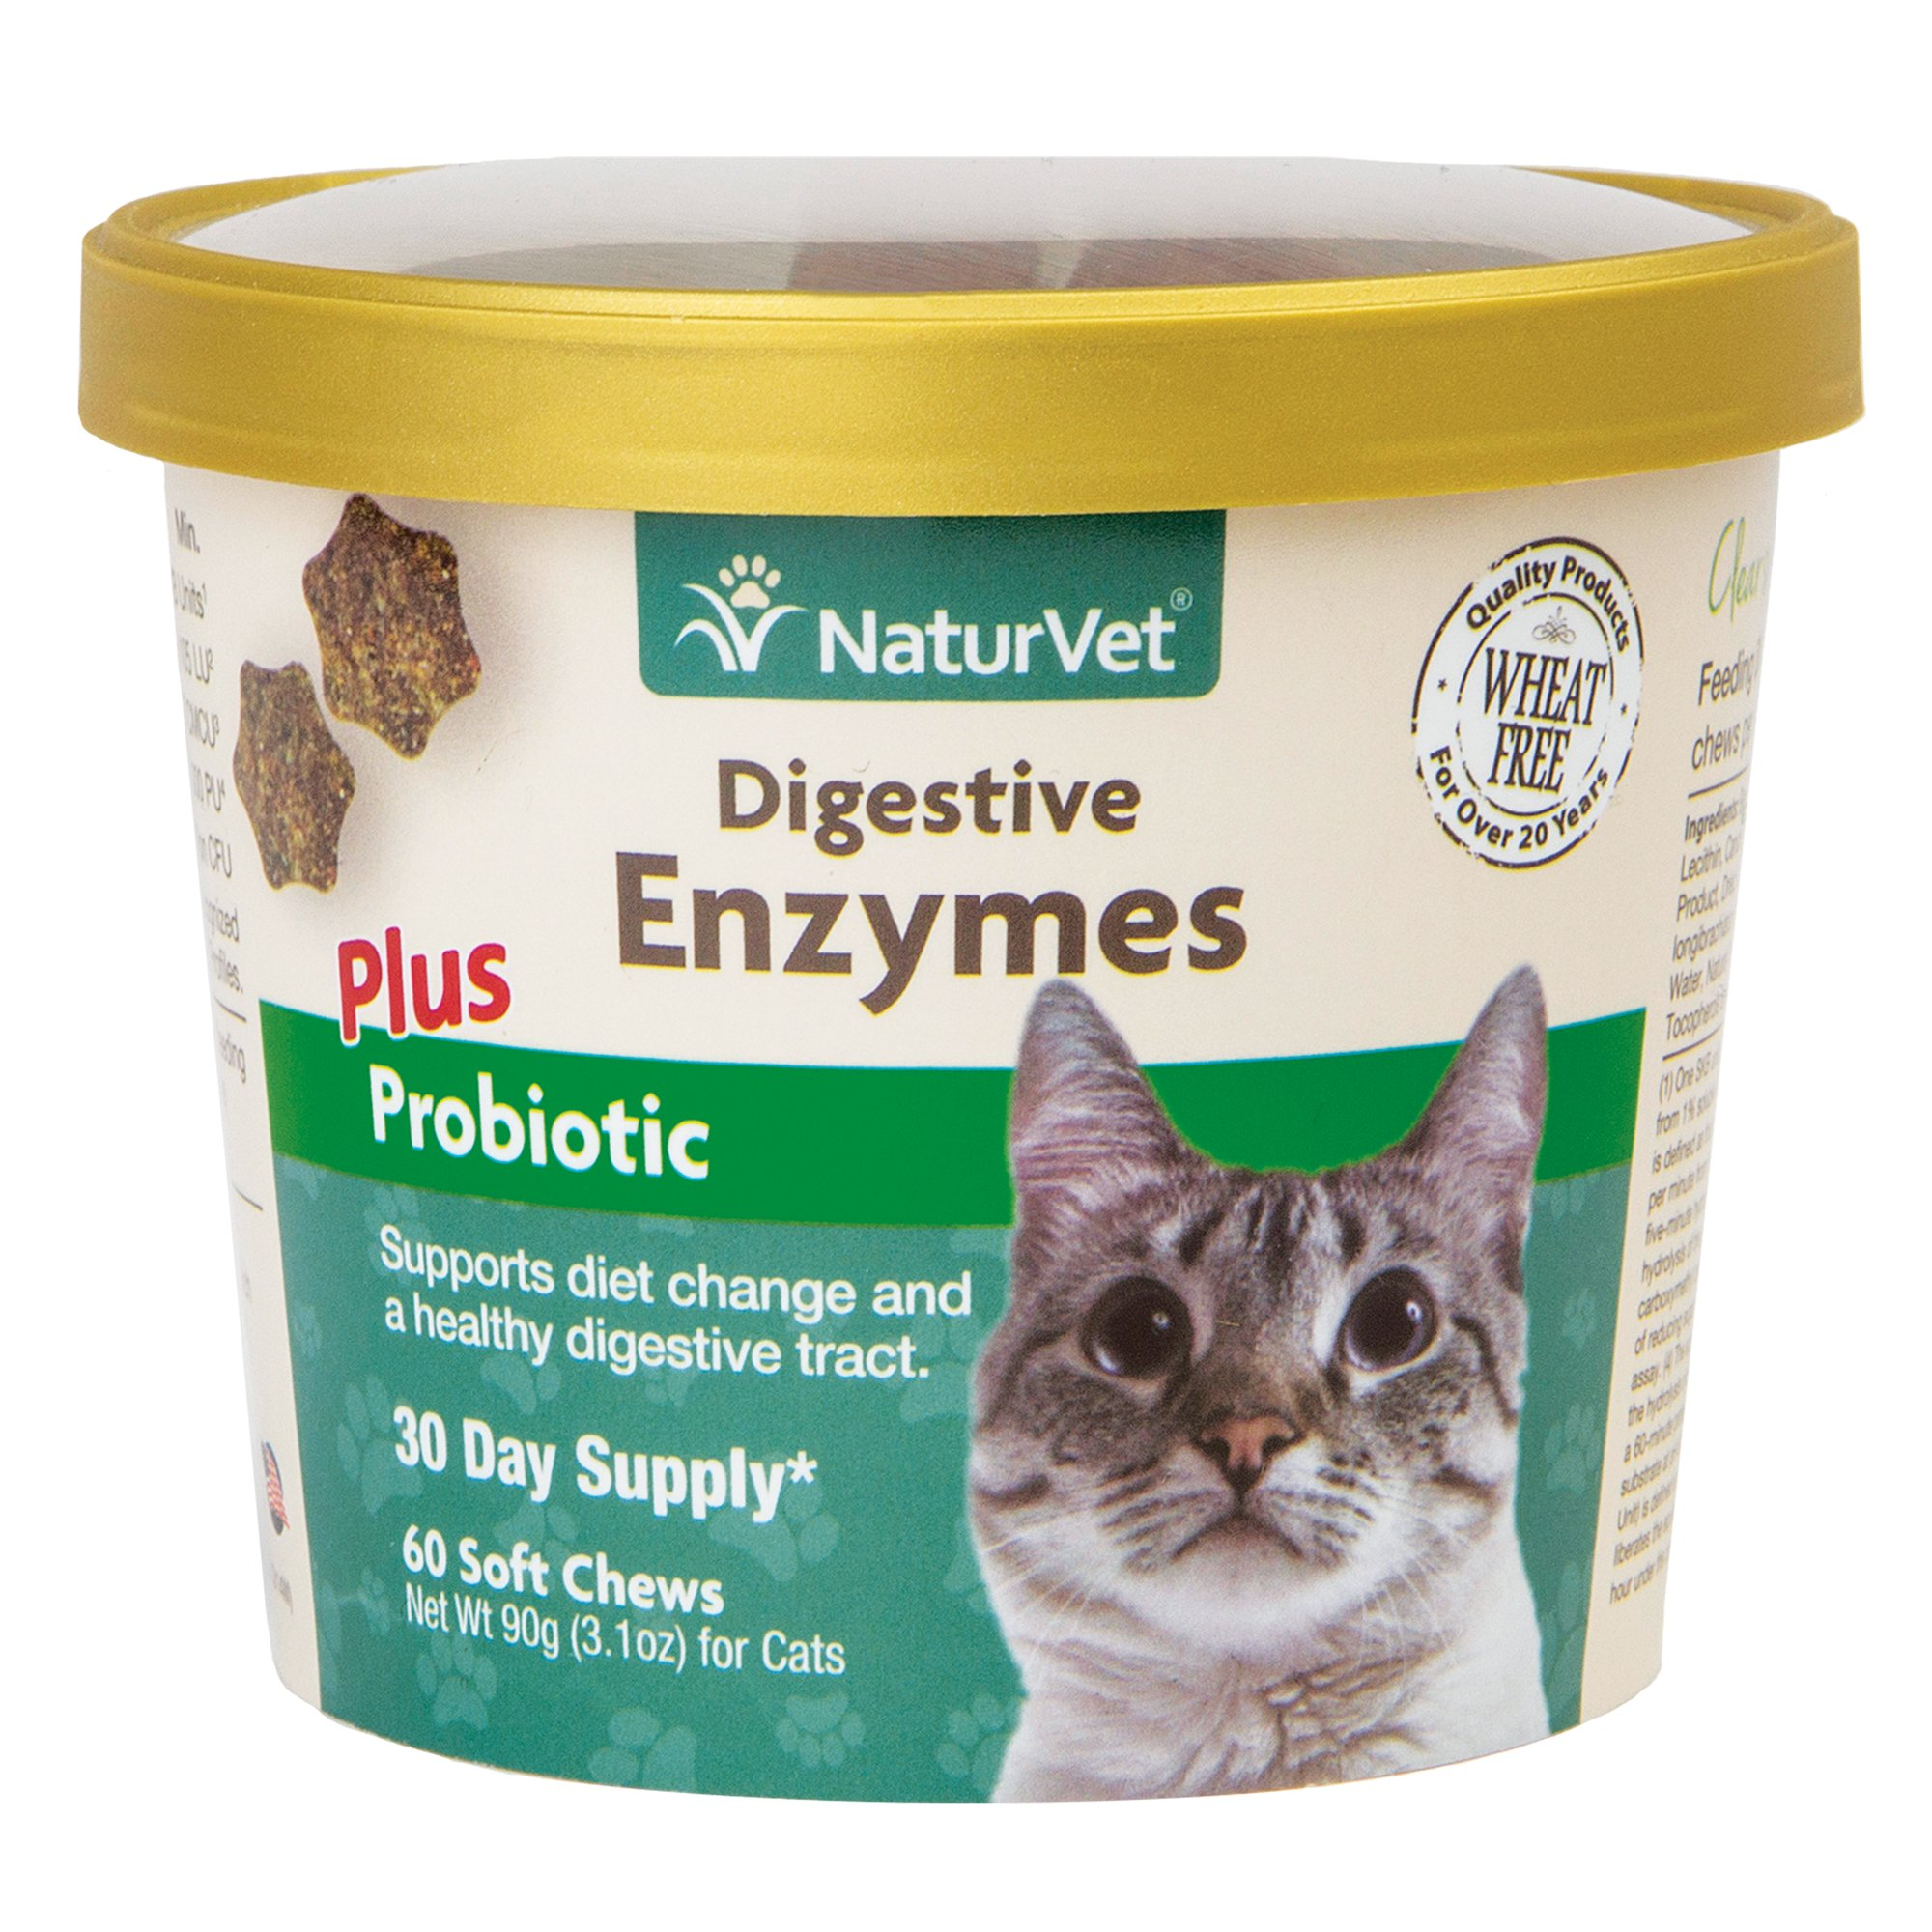 NaturVet Digestive Enzymes Cat Supplement